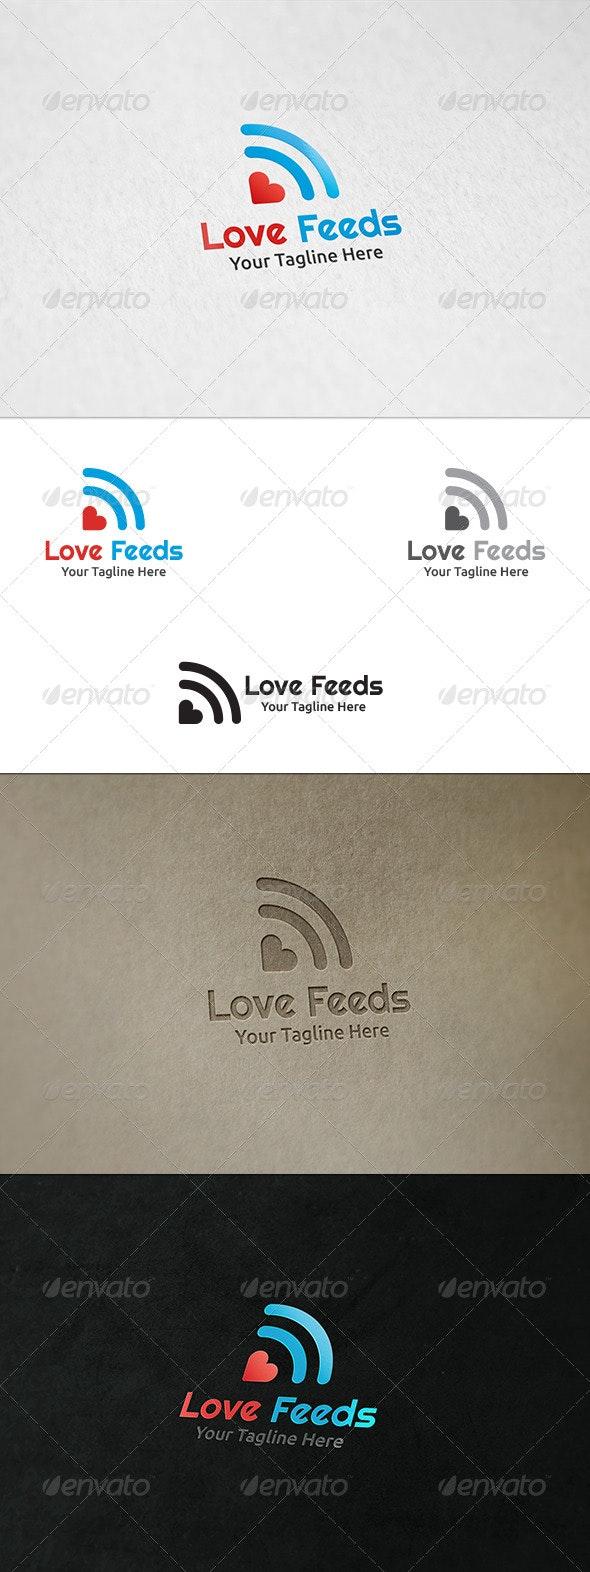 Love Feeds - Logo Template - Symbols Logo Templates